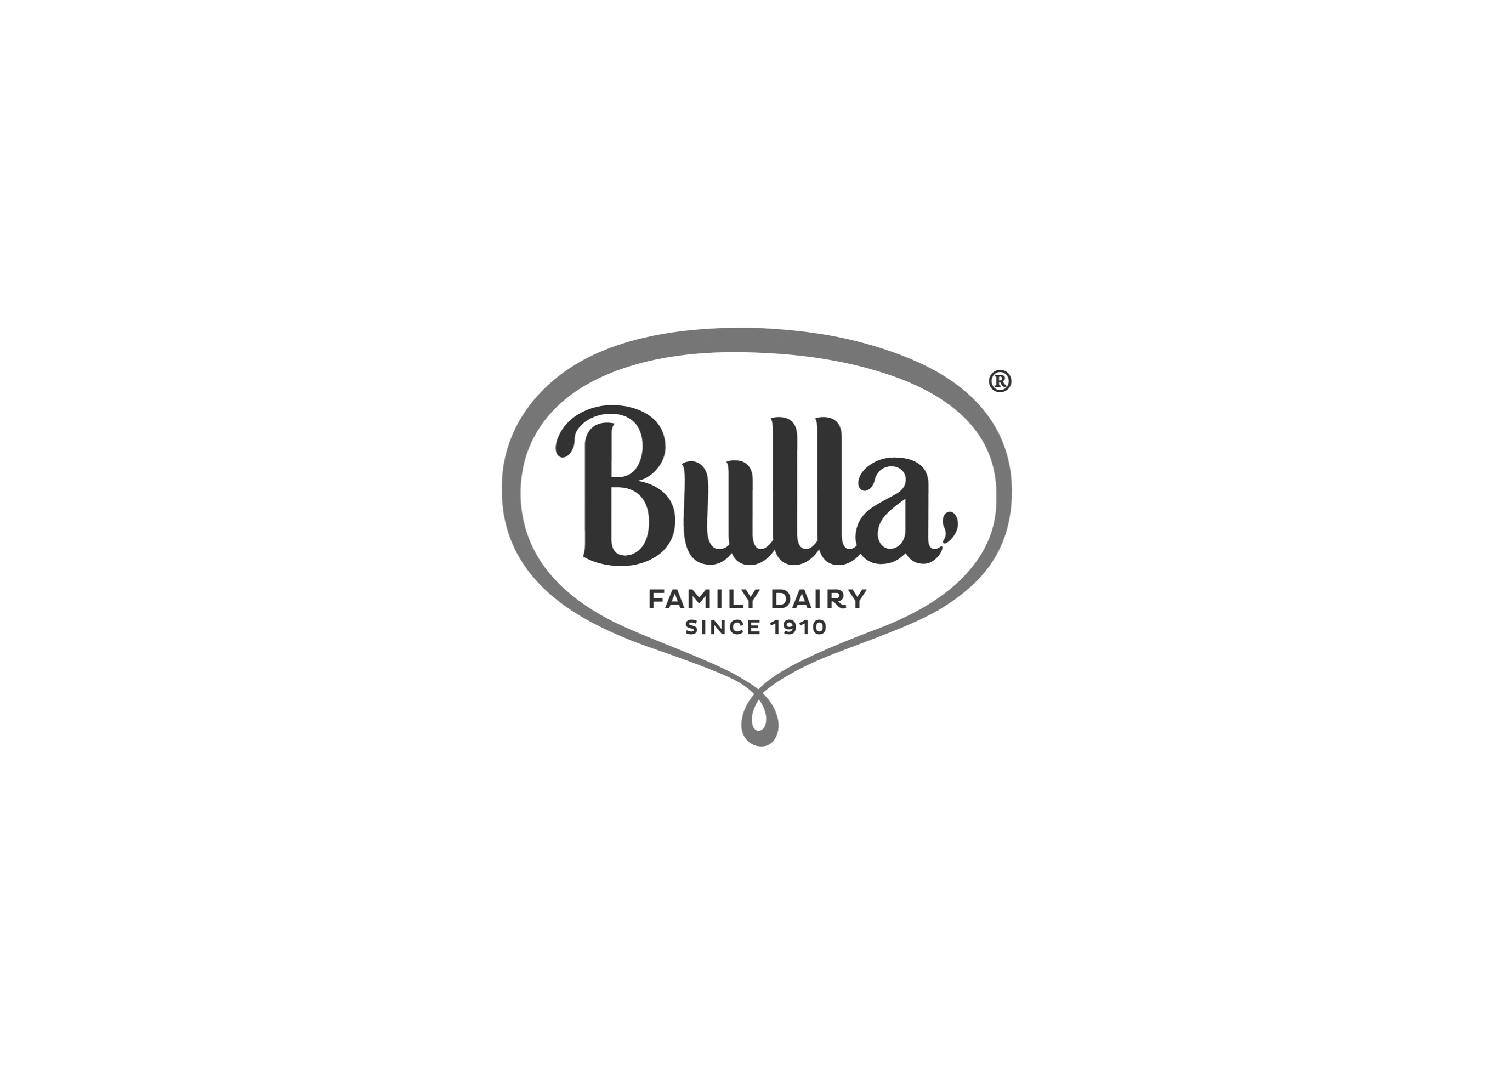 Bulla-01.jpg